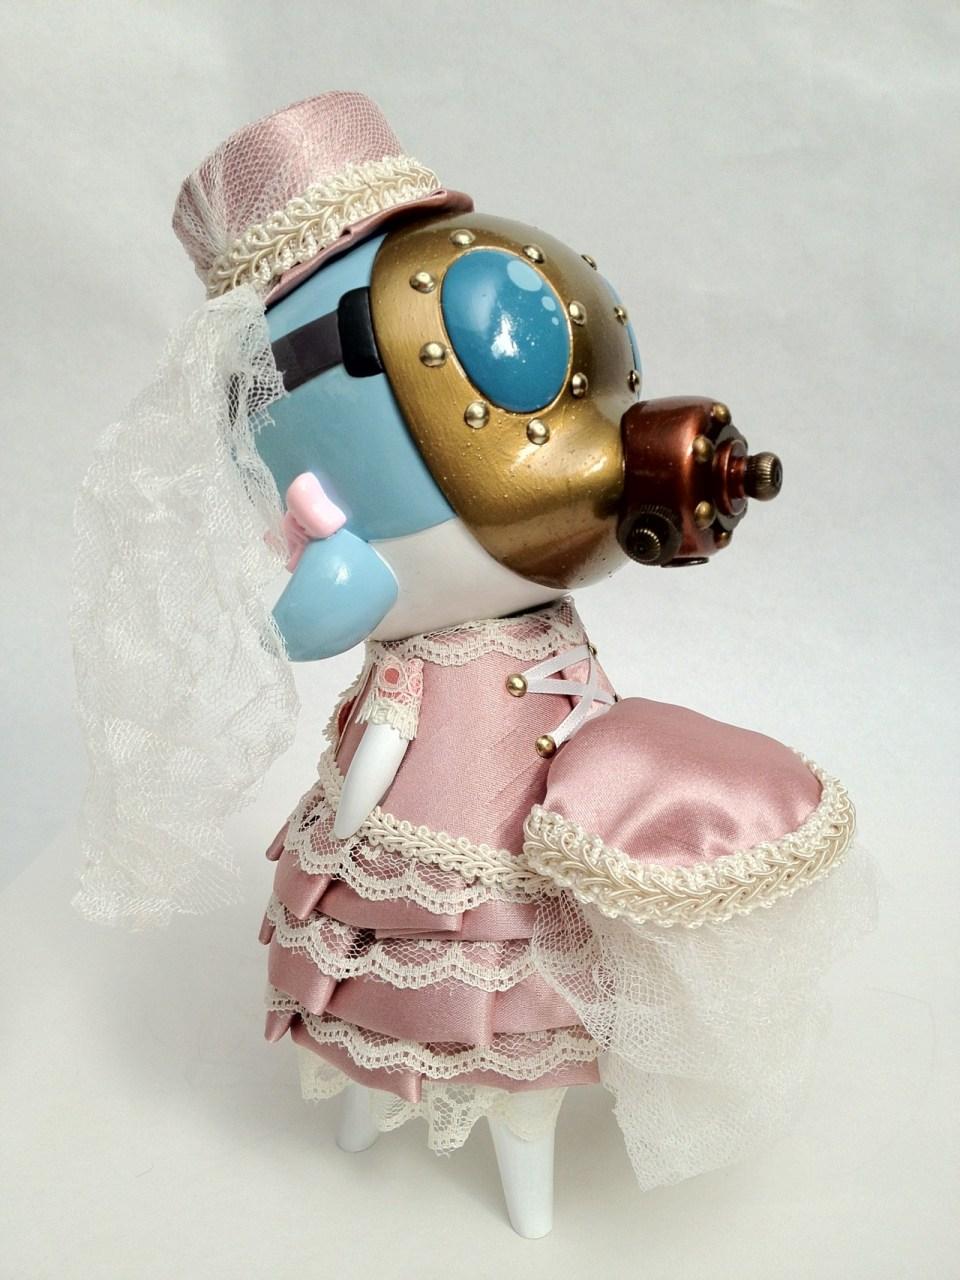 Charlotte, Circa 1886 Steampunk Doll